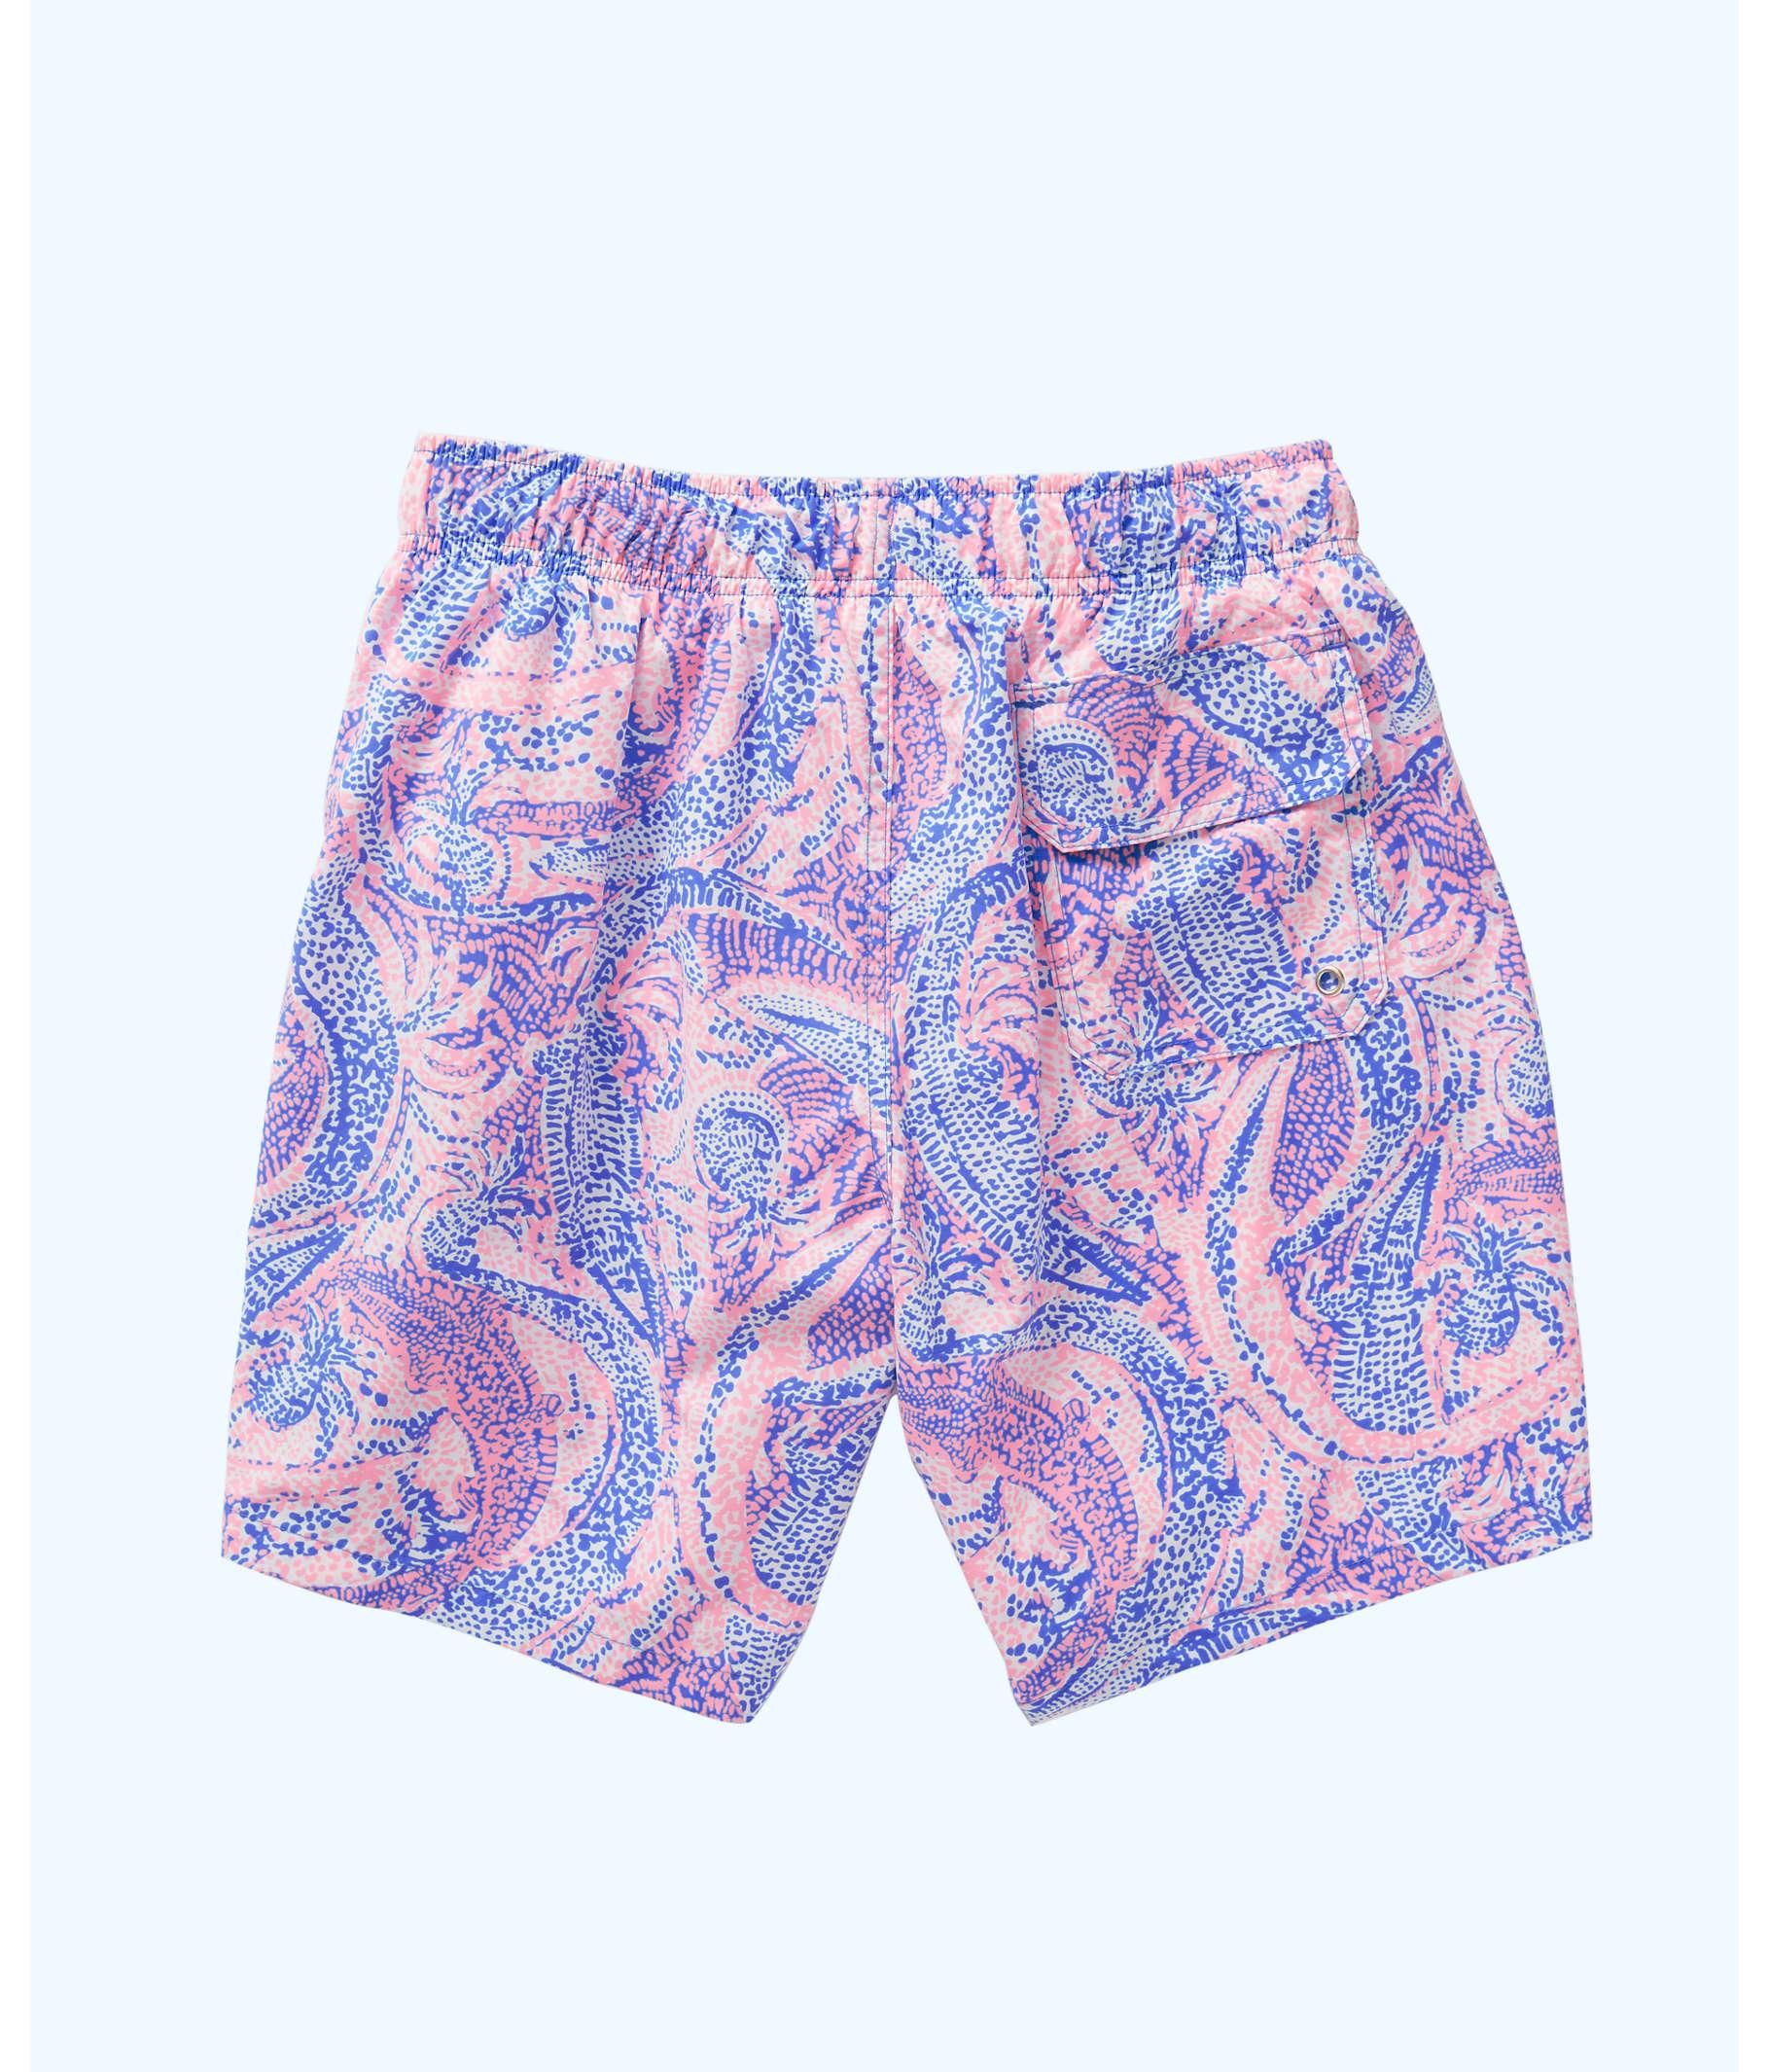 5ecfeb5709 Mens Capri Swim Trunks, Coastal Blue Maybe Gator, large ...